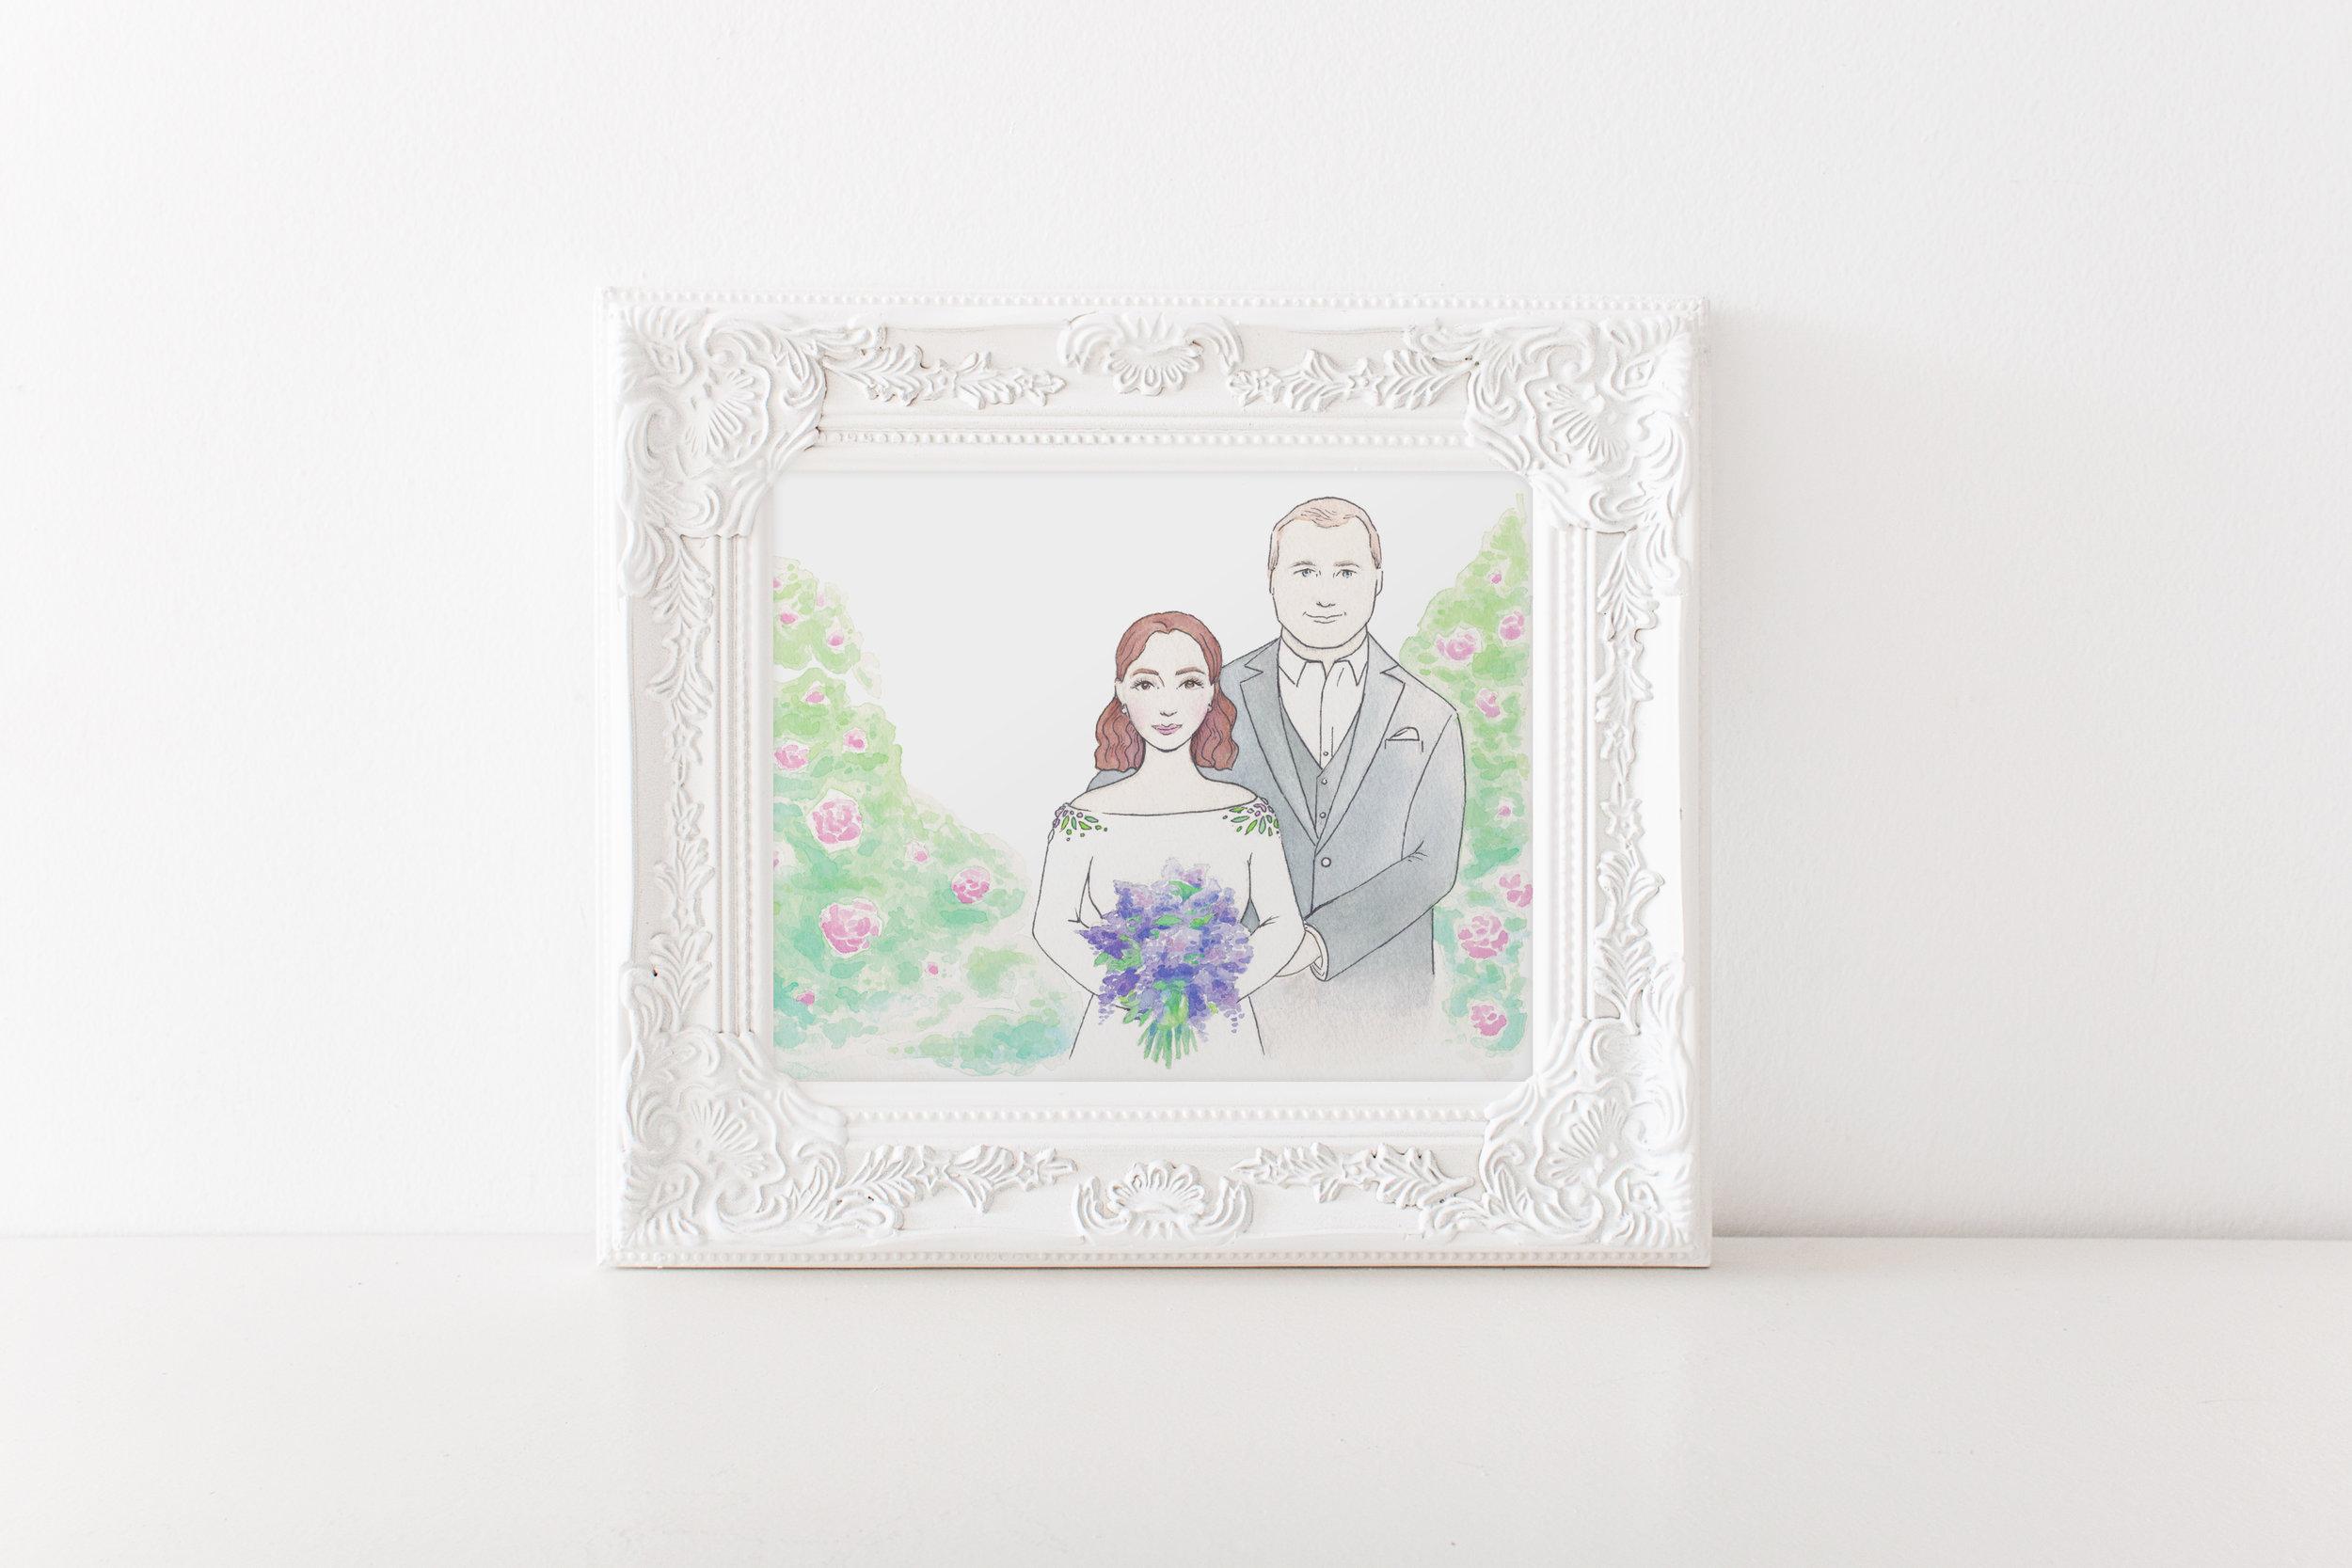 Custom Wedding Art & Design - Keepsake art, invitation designs, gifts and more!